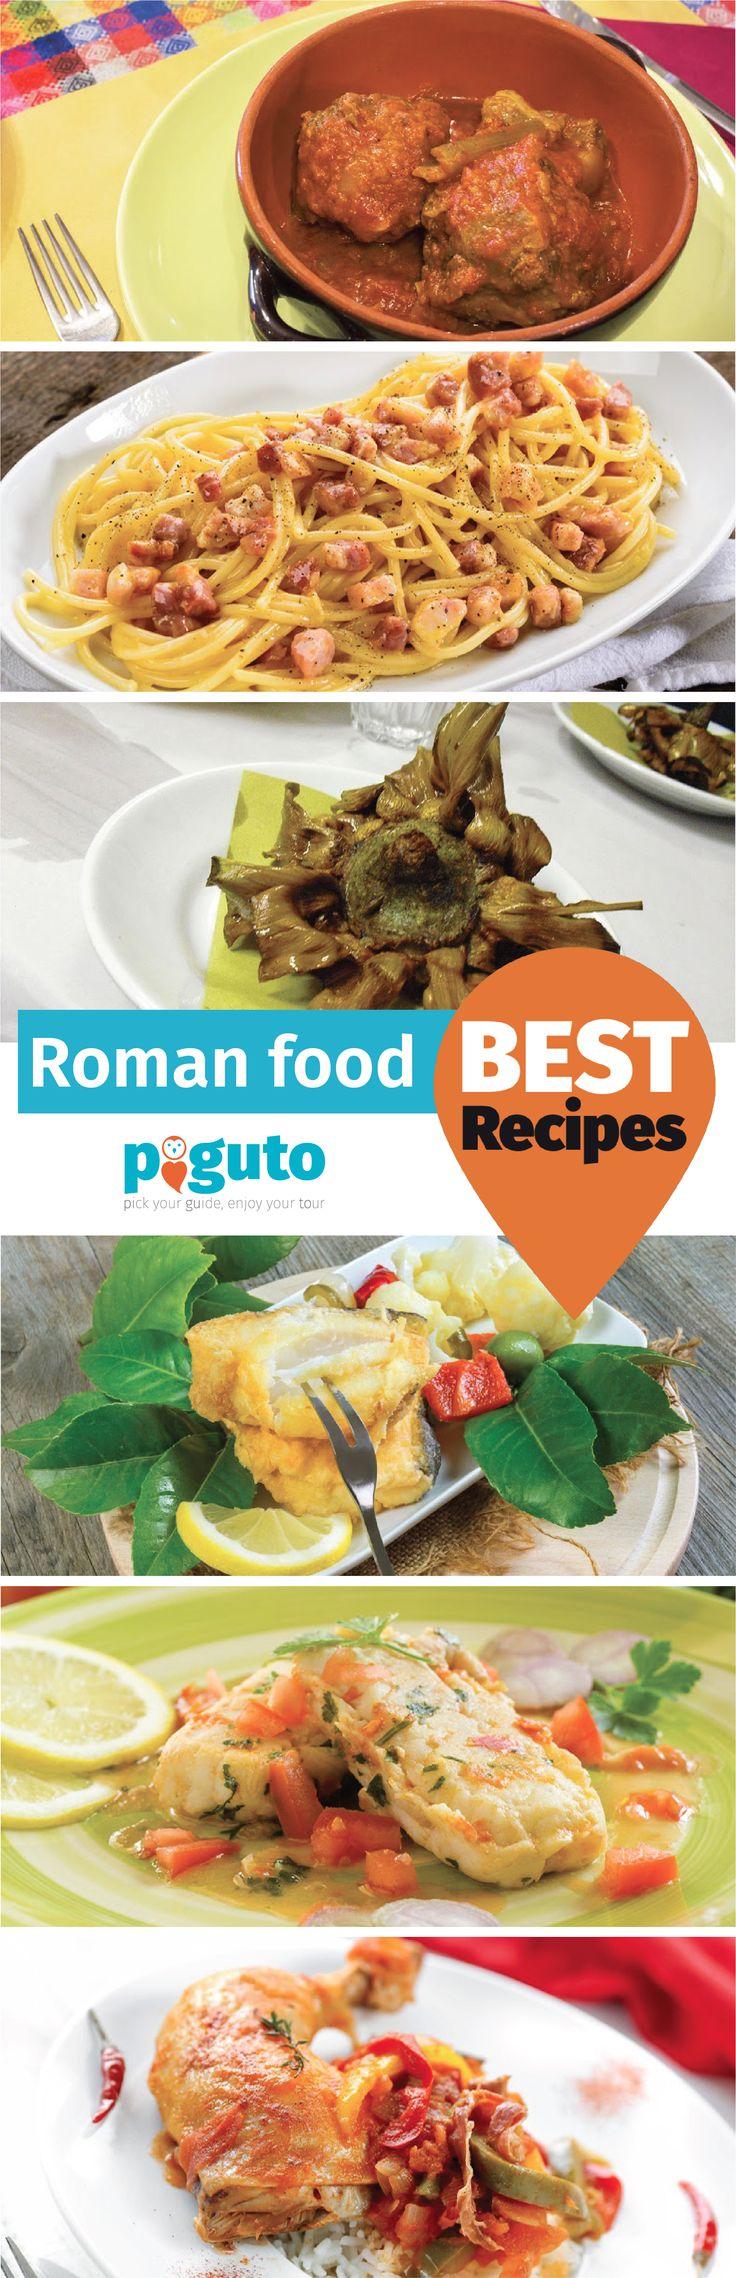 The best roman dishes: the cradle of Italian cuisine